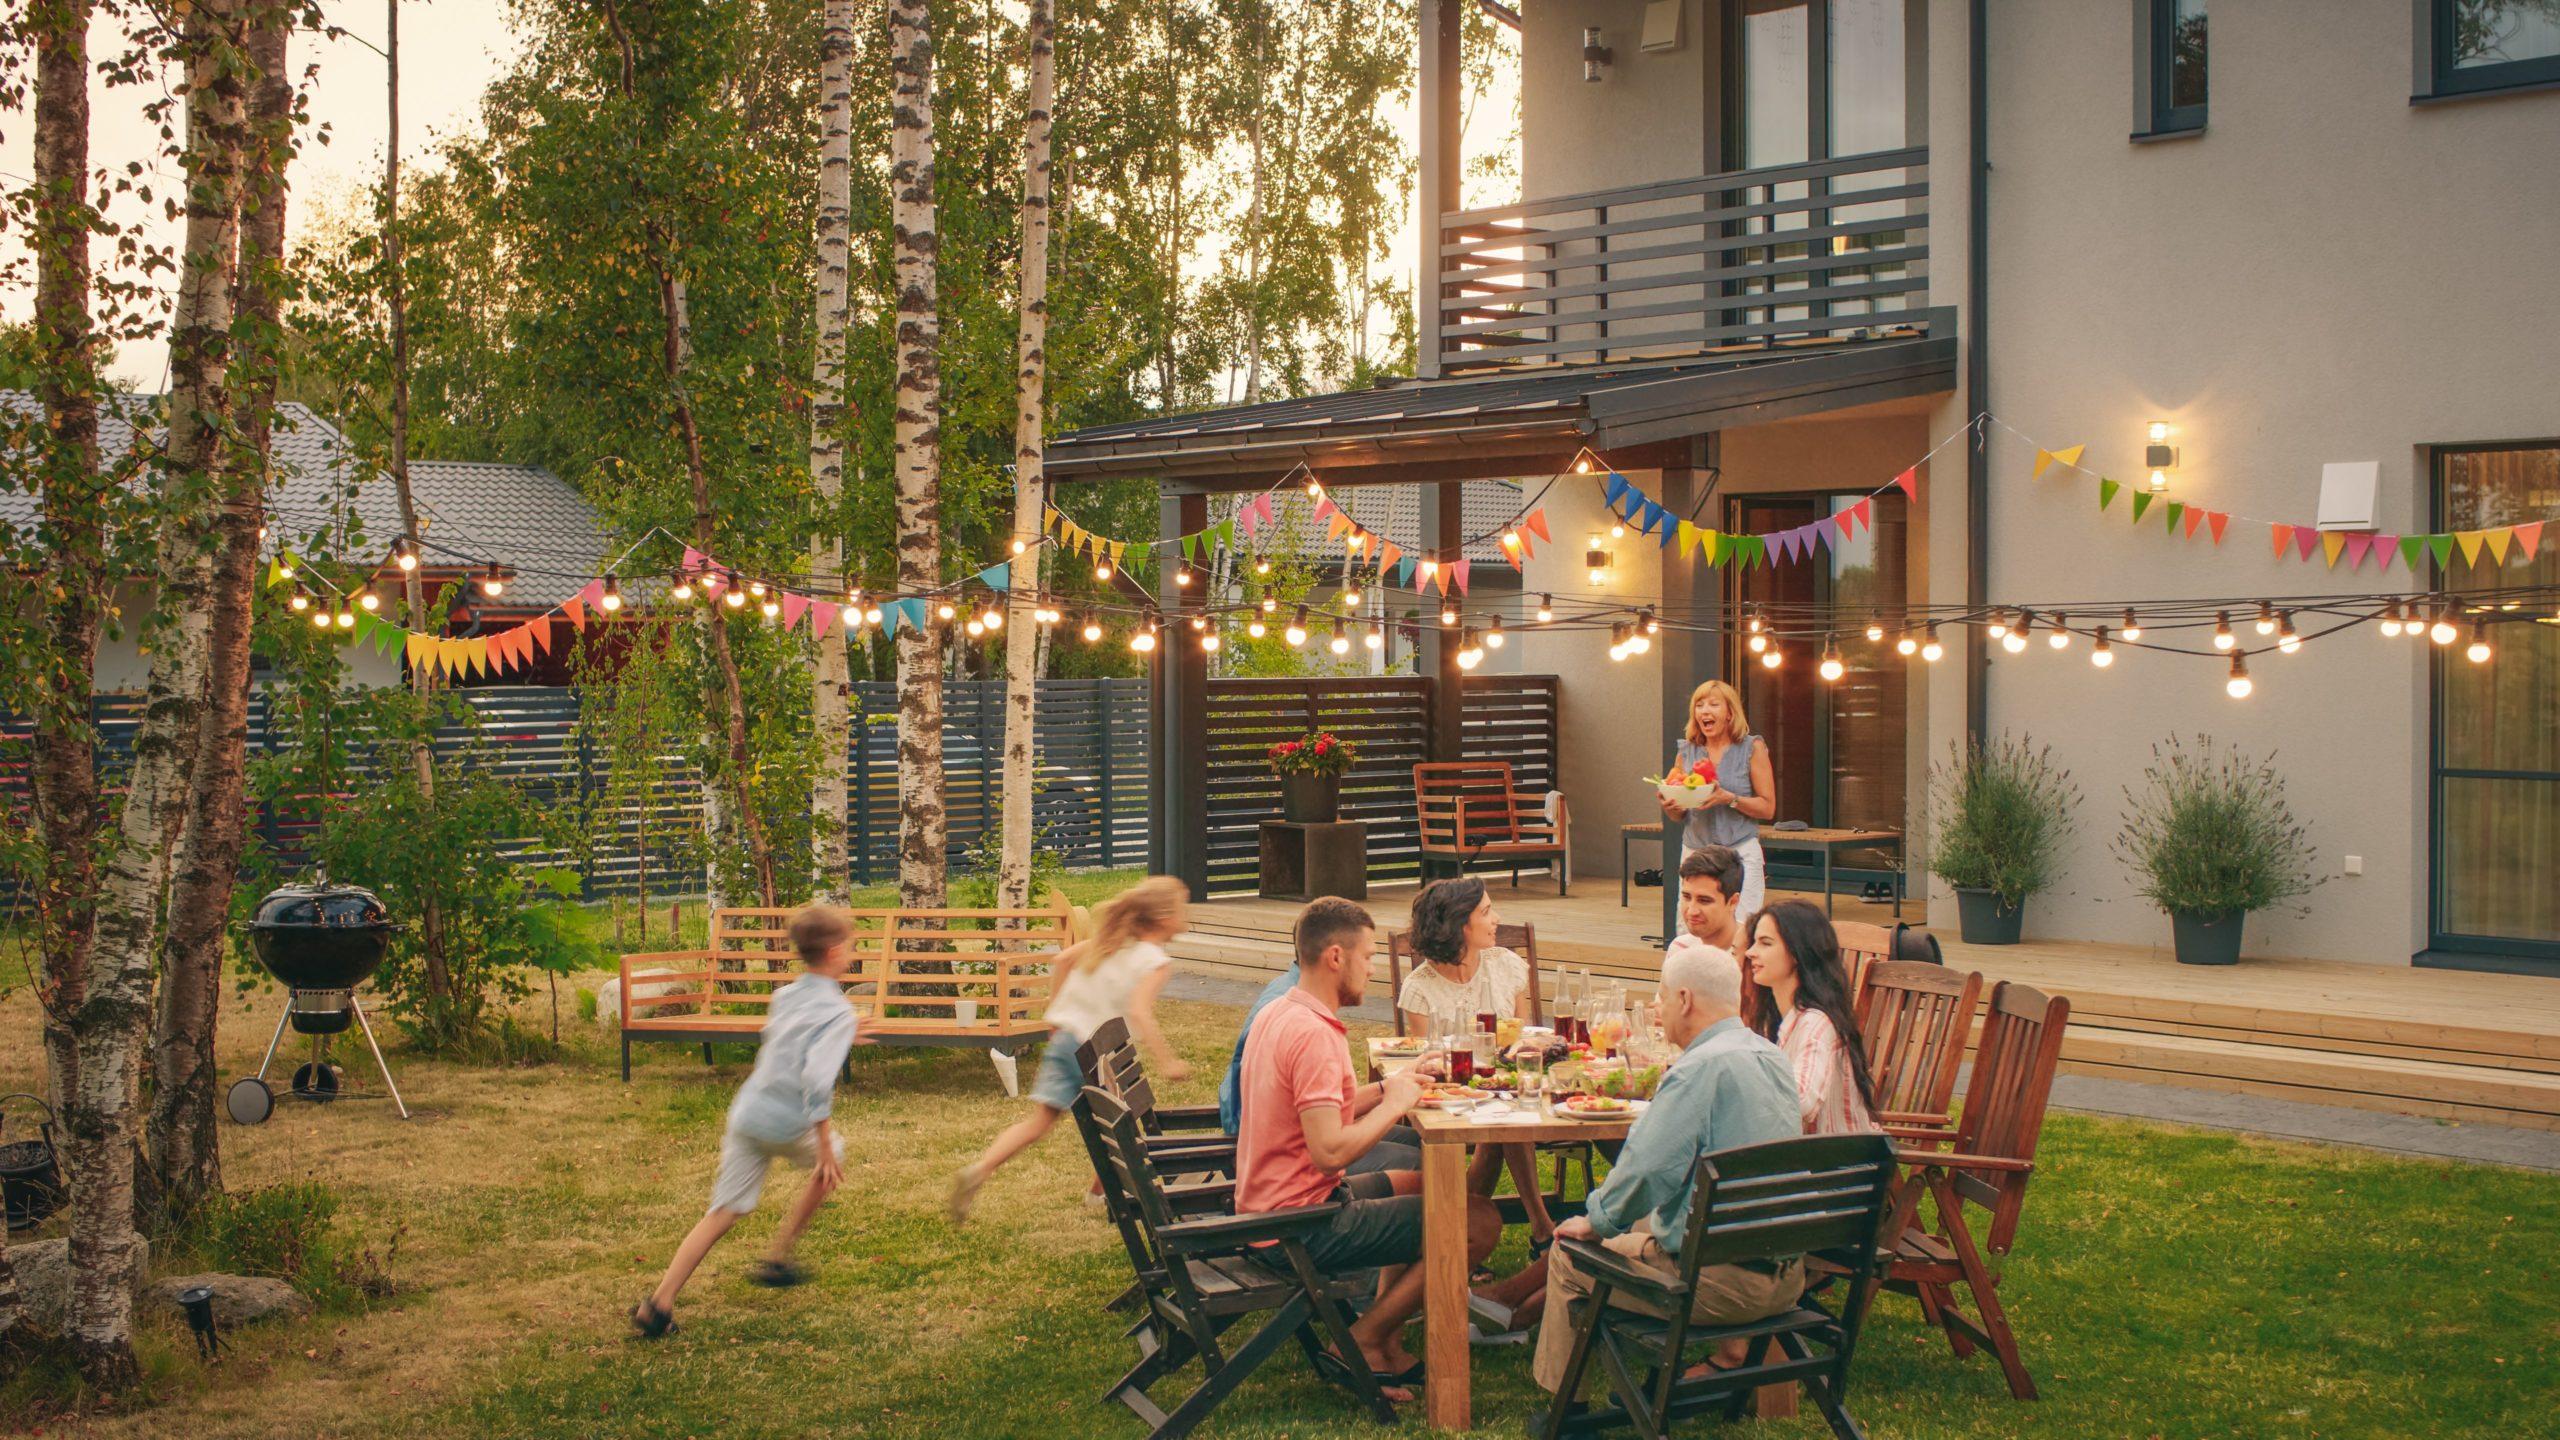 A family having a backyard barbecue